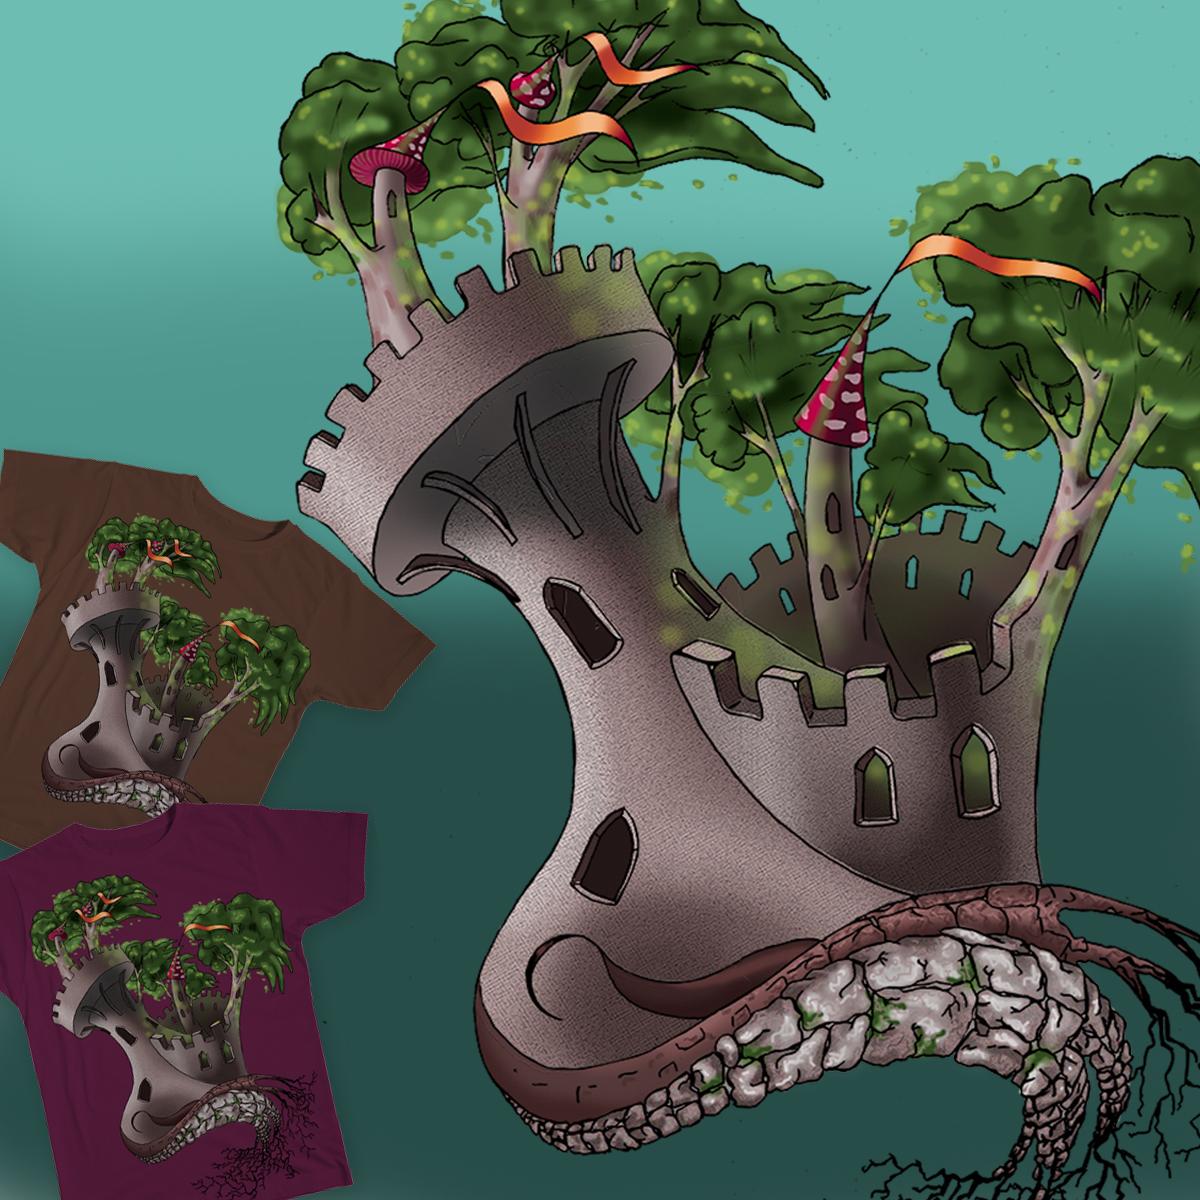 tree castle by nyoo_4c on Threadless